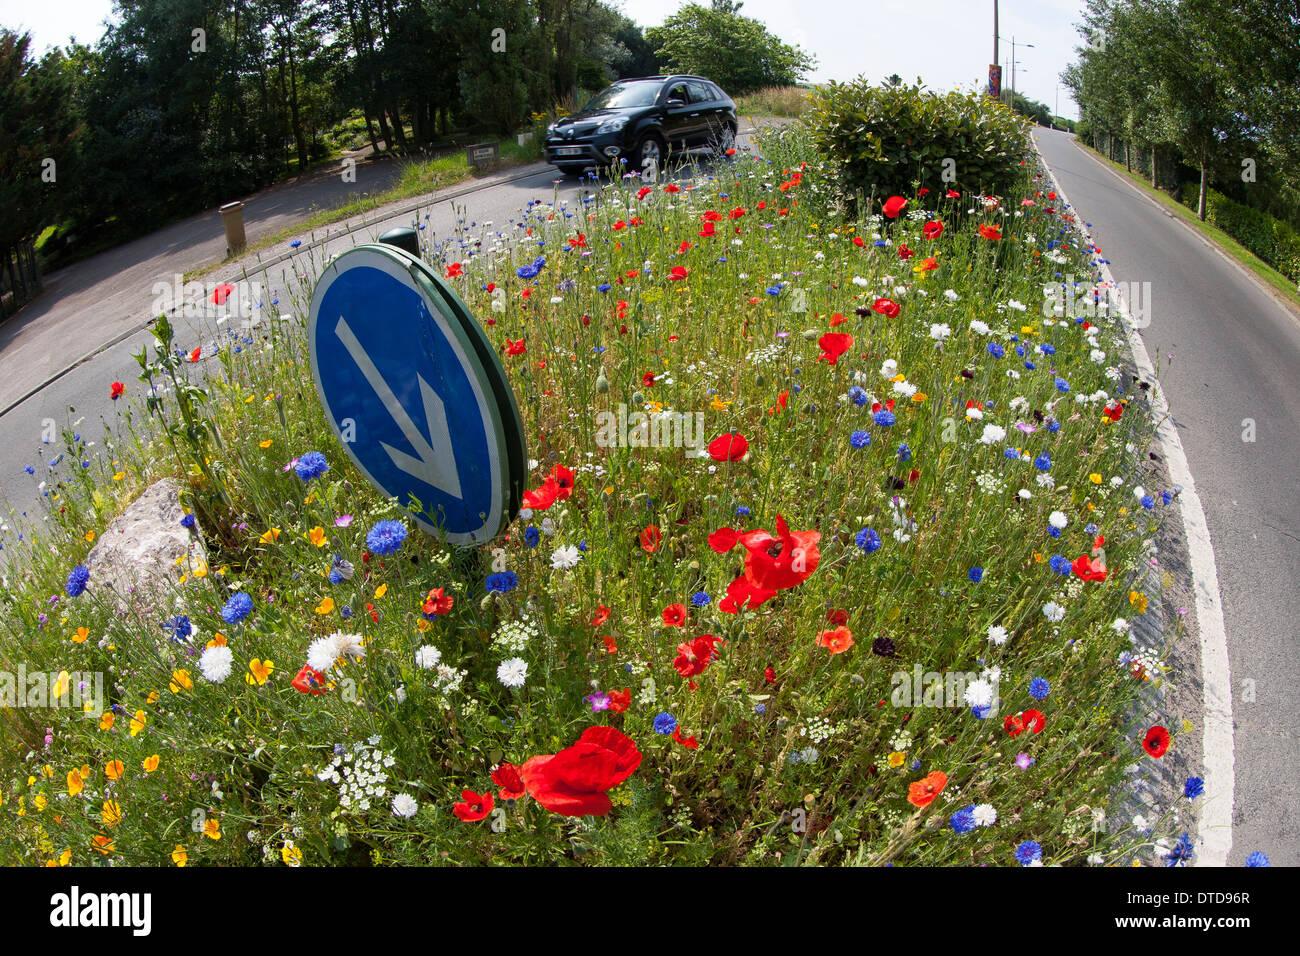 Huerto, cama de flores, flores, prados floridos, tráfico, REFUGIO refugio peatonal isla, carretera, Blumenwiese, Verkehrsinsel Imagen De Stock